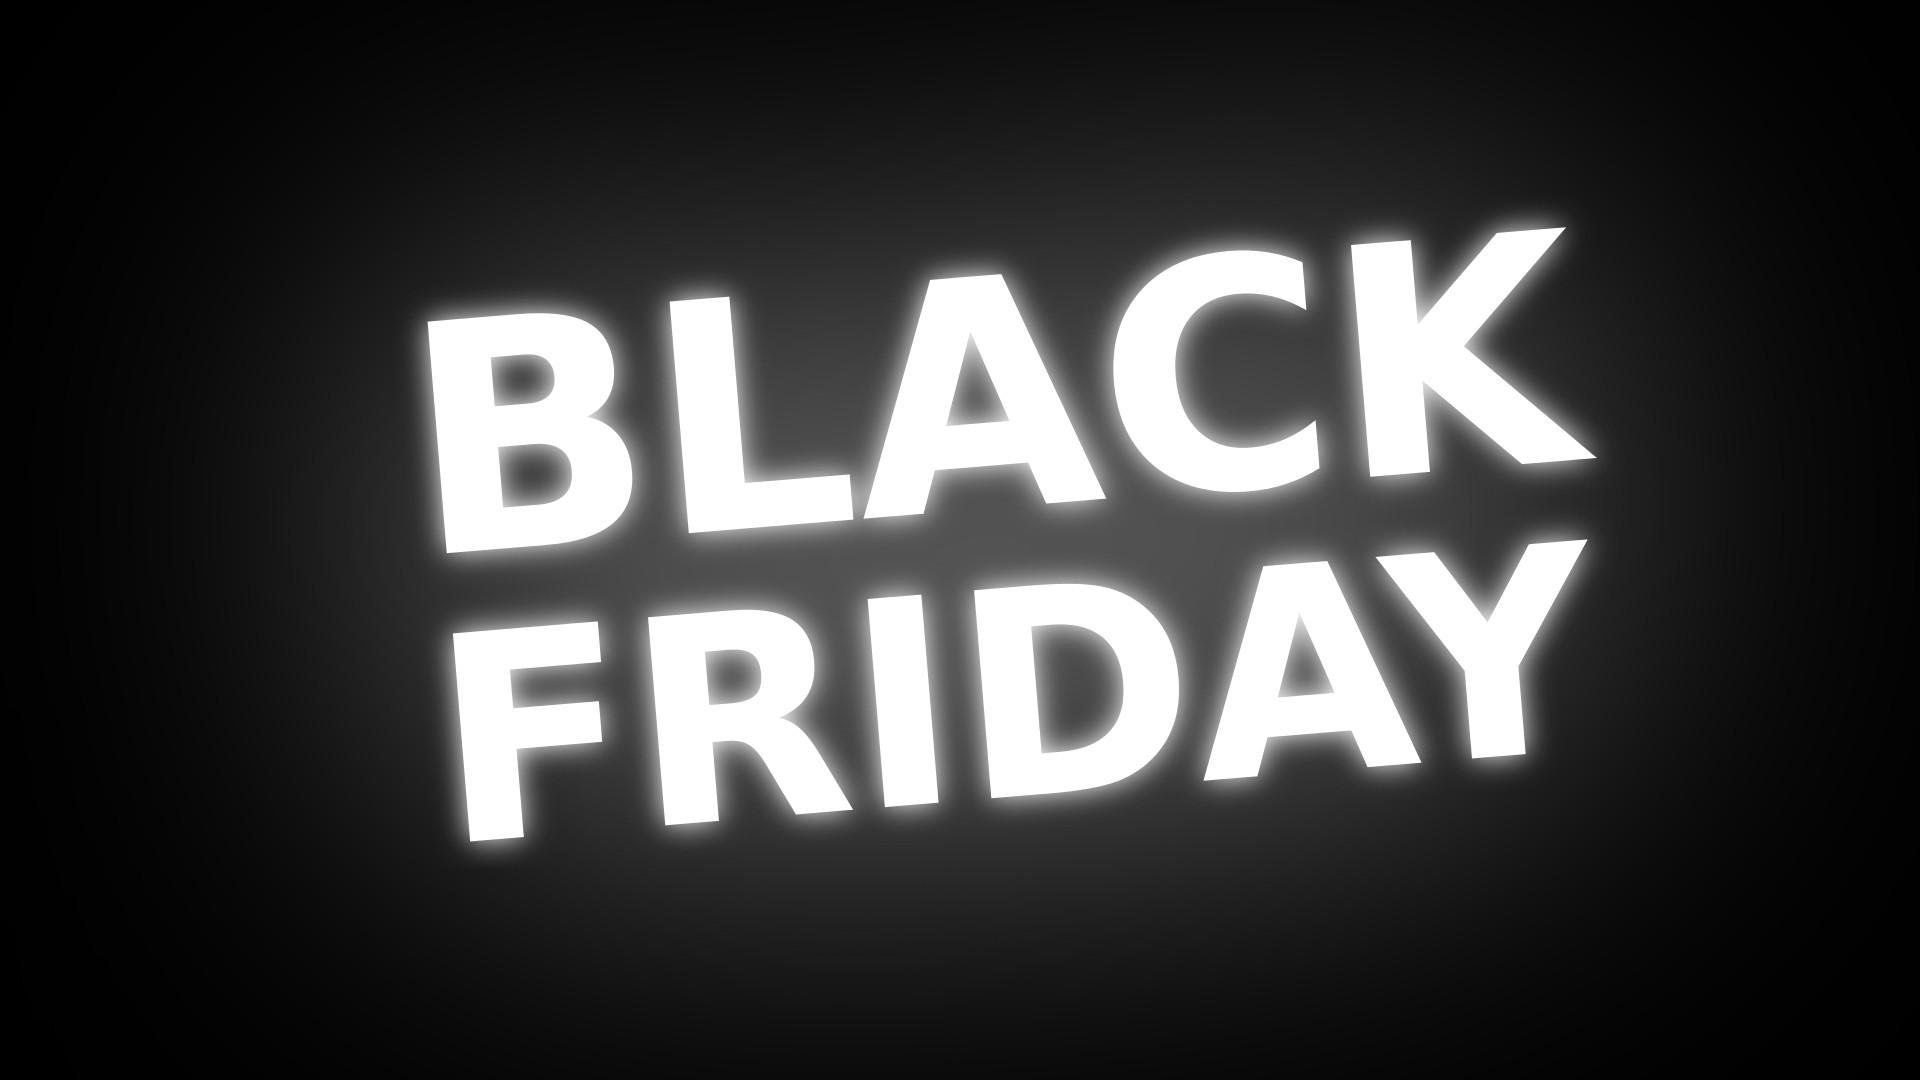 Black Friday Free Wallpaper